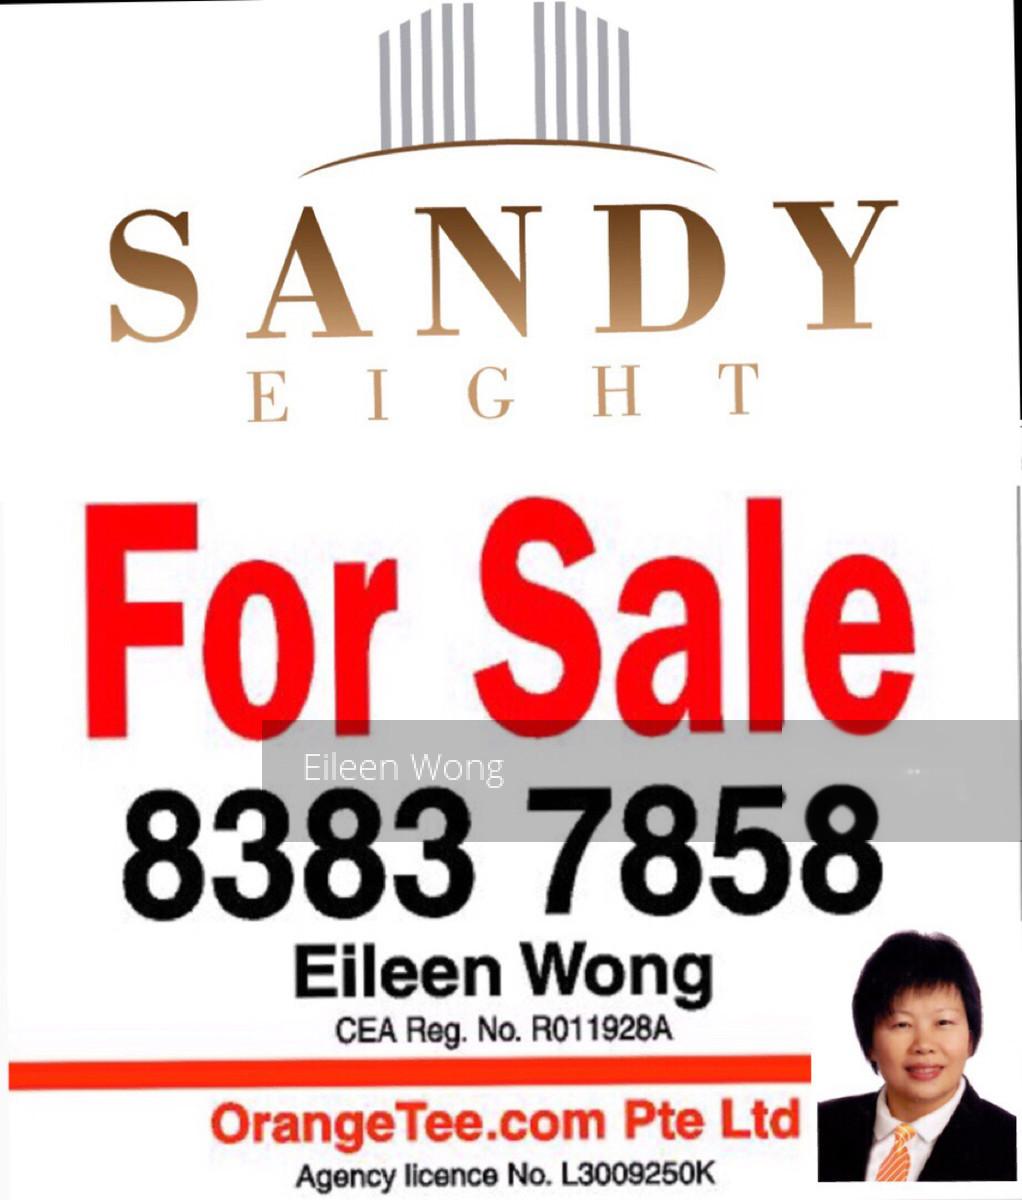 Sandy Eight